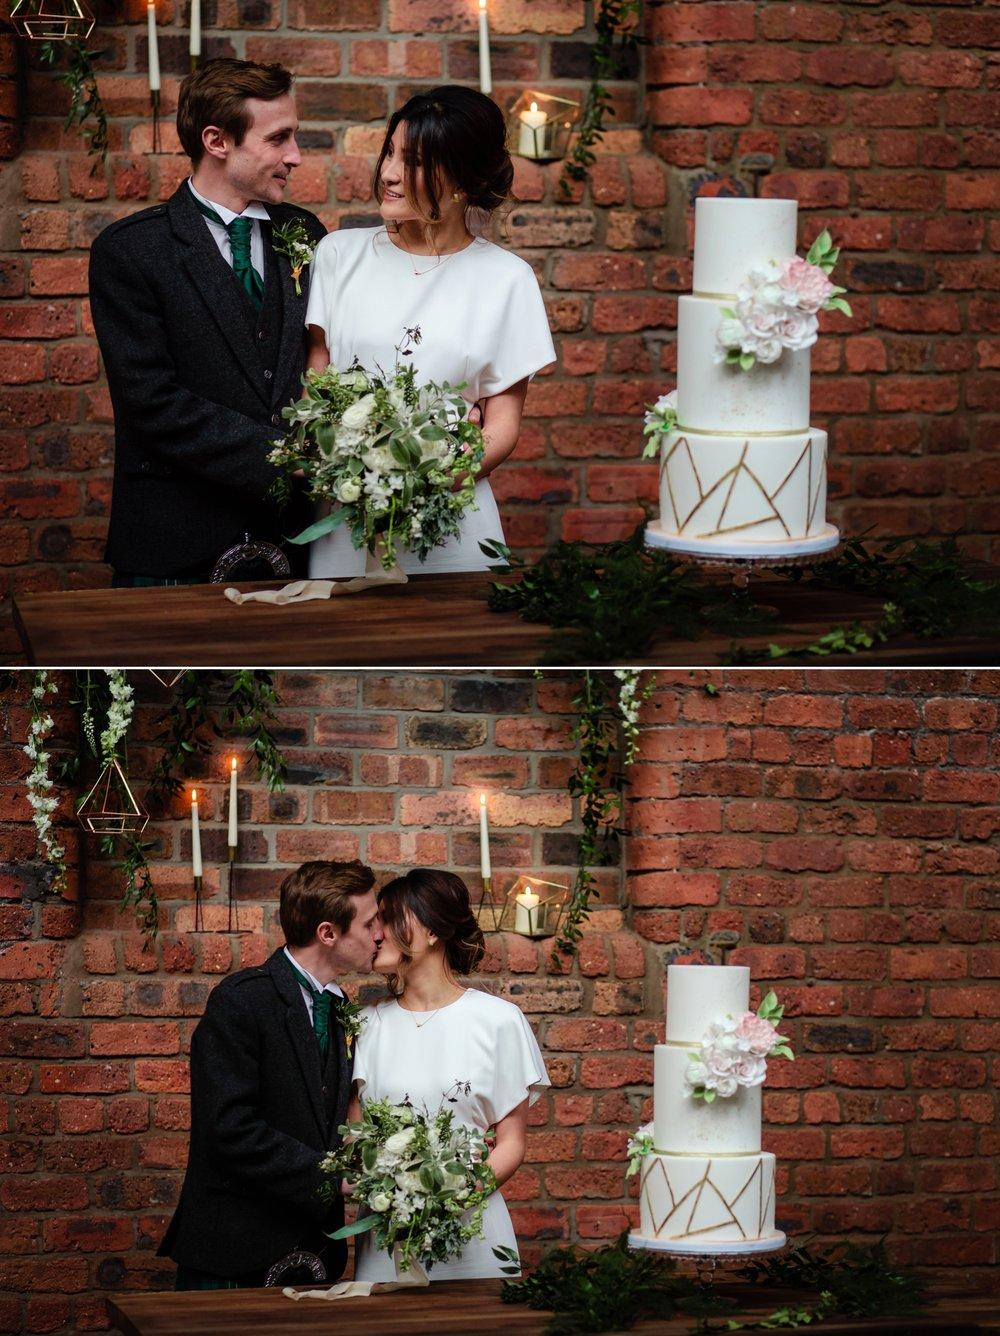 engine-works-wedding-styled-shoot-fotomaki-photography-112.jpg